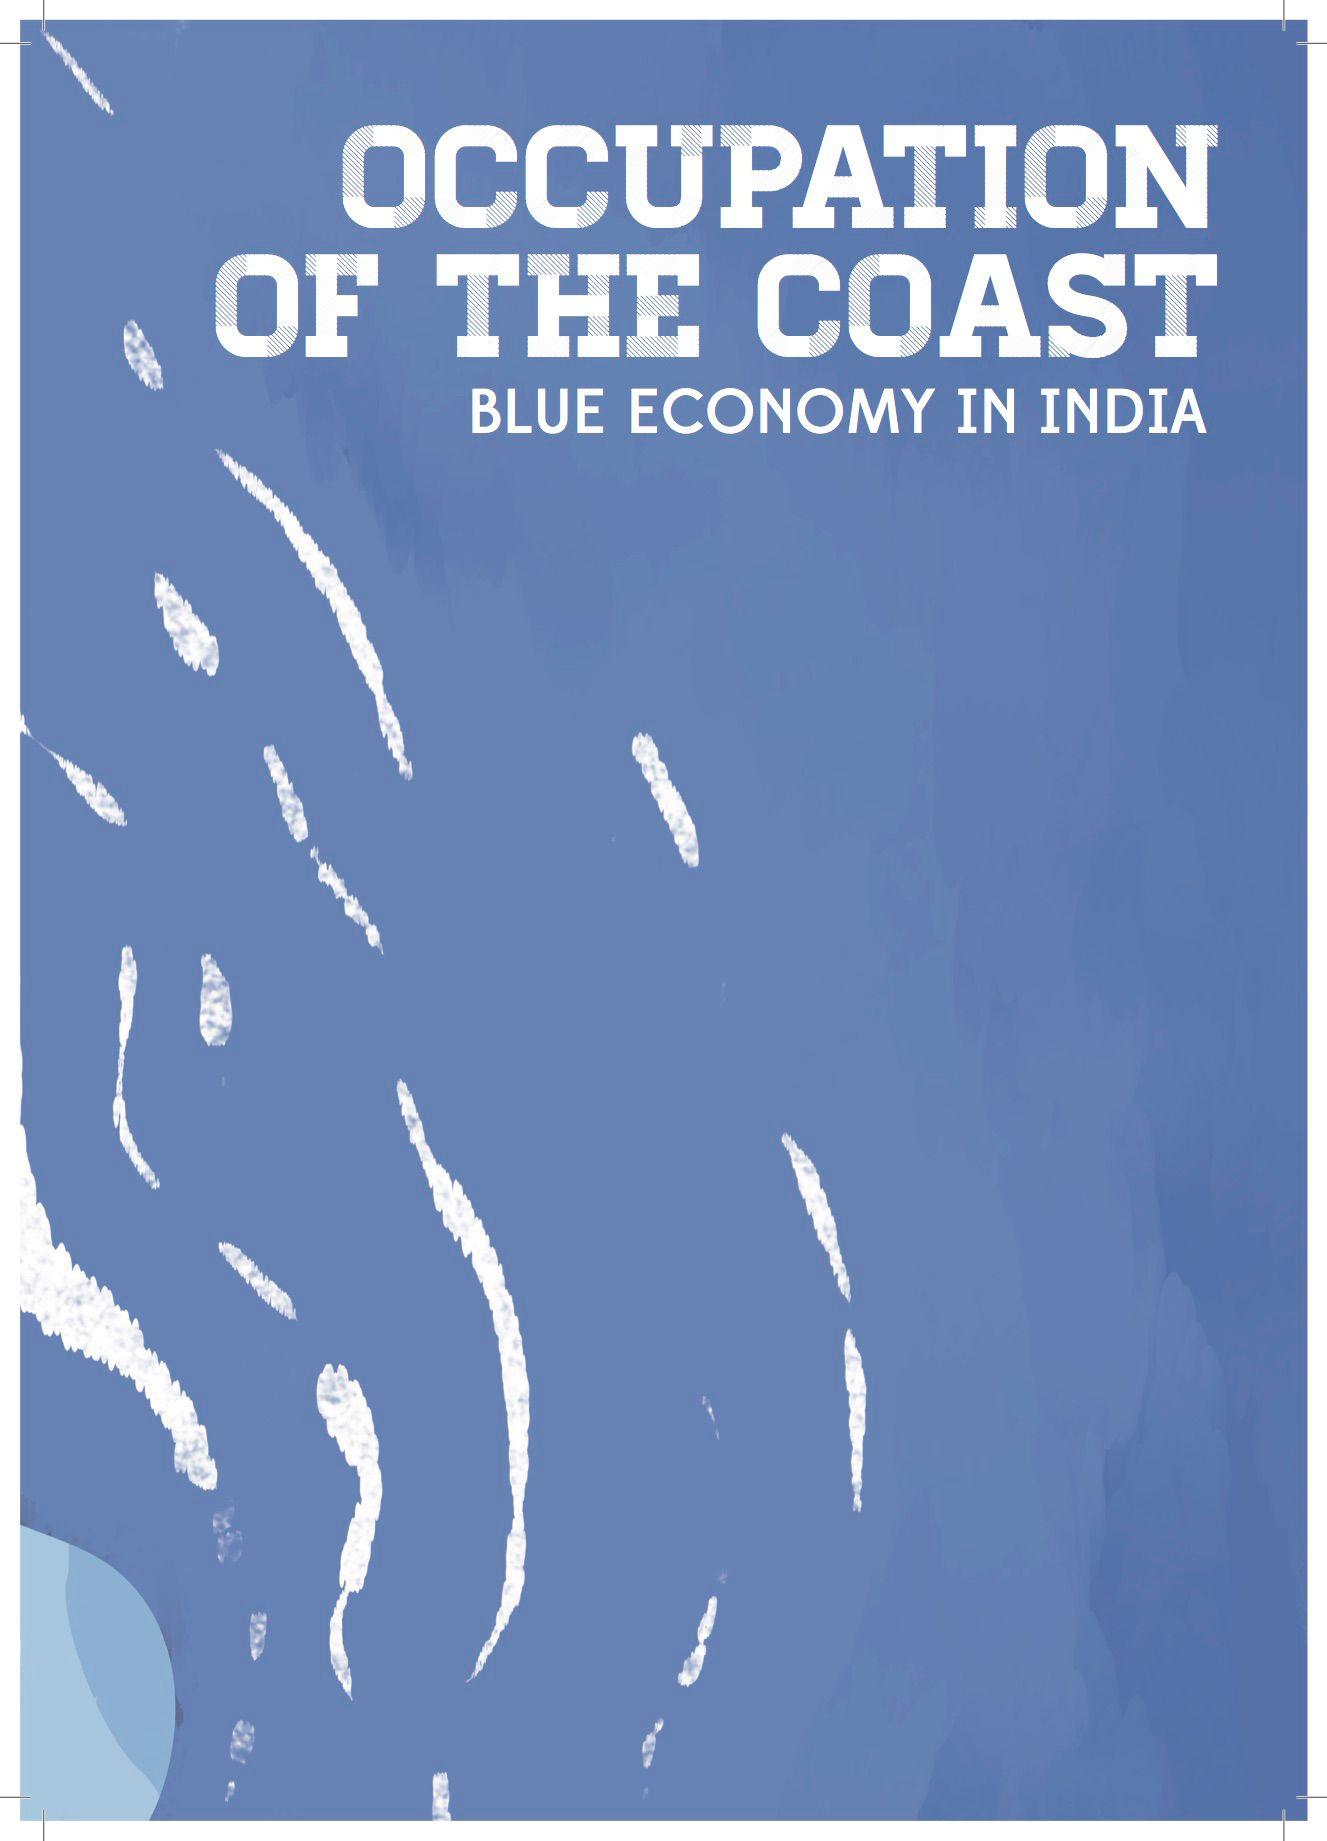 The Blue Economy Book